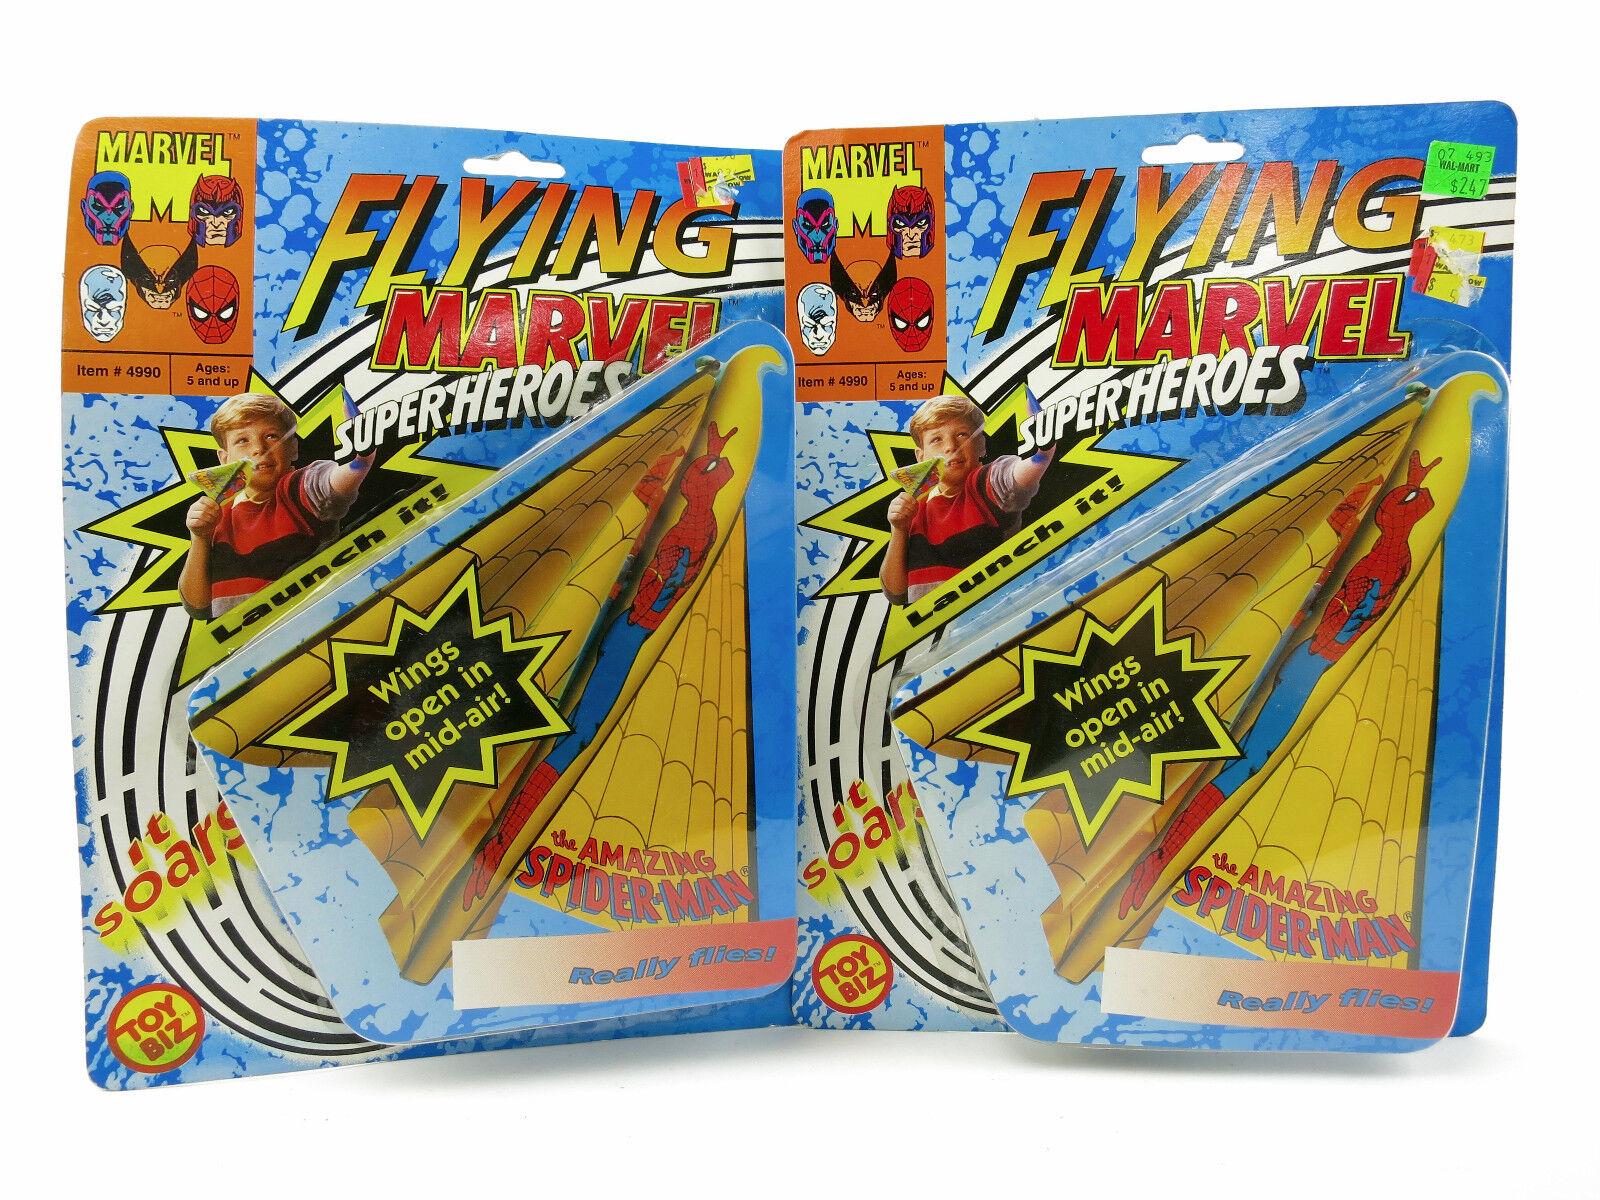 Lot of 2 1991 Toybiz Flying Marvel Super Heroes NEW Amazing Spider Man Toy Plane